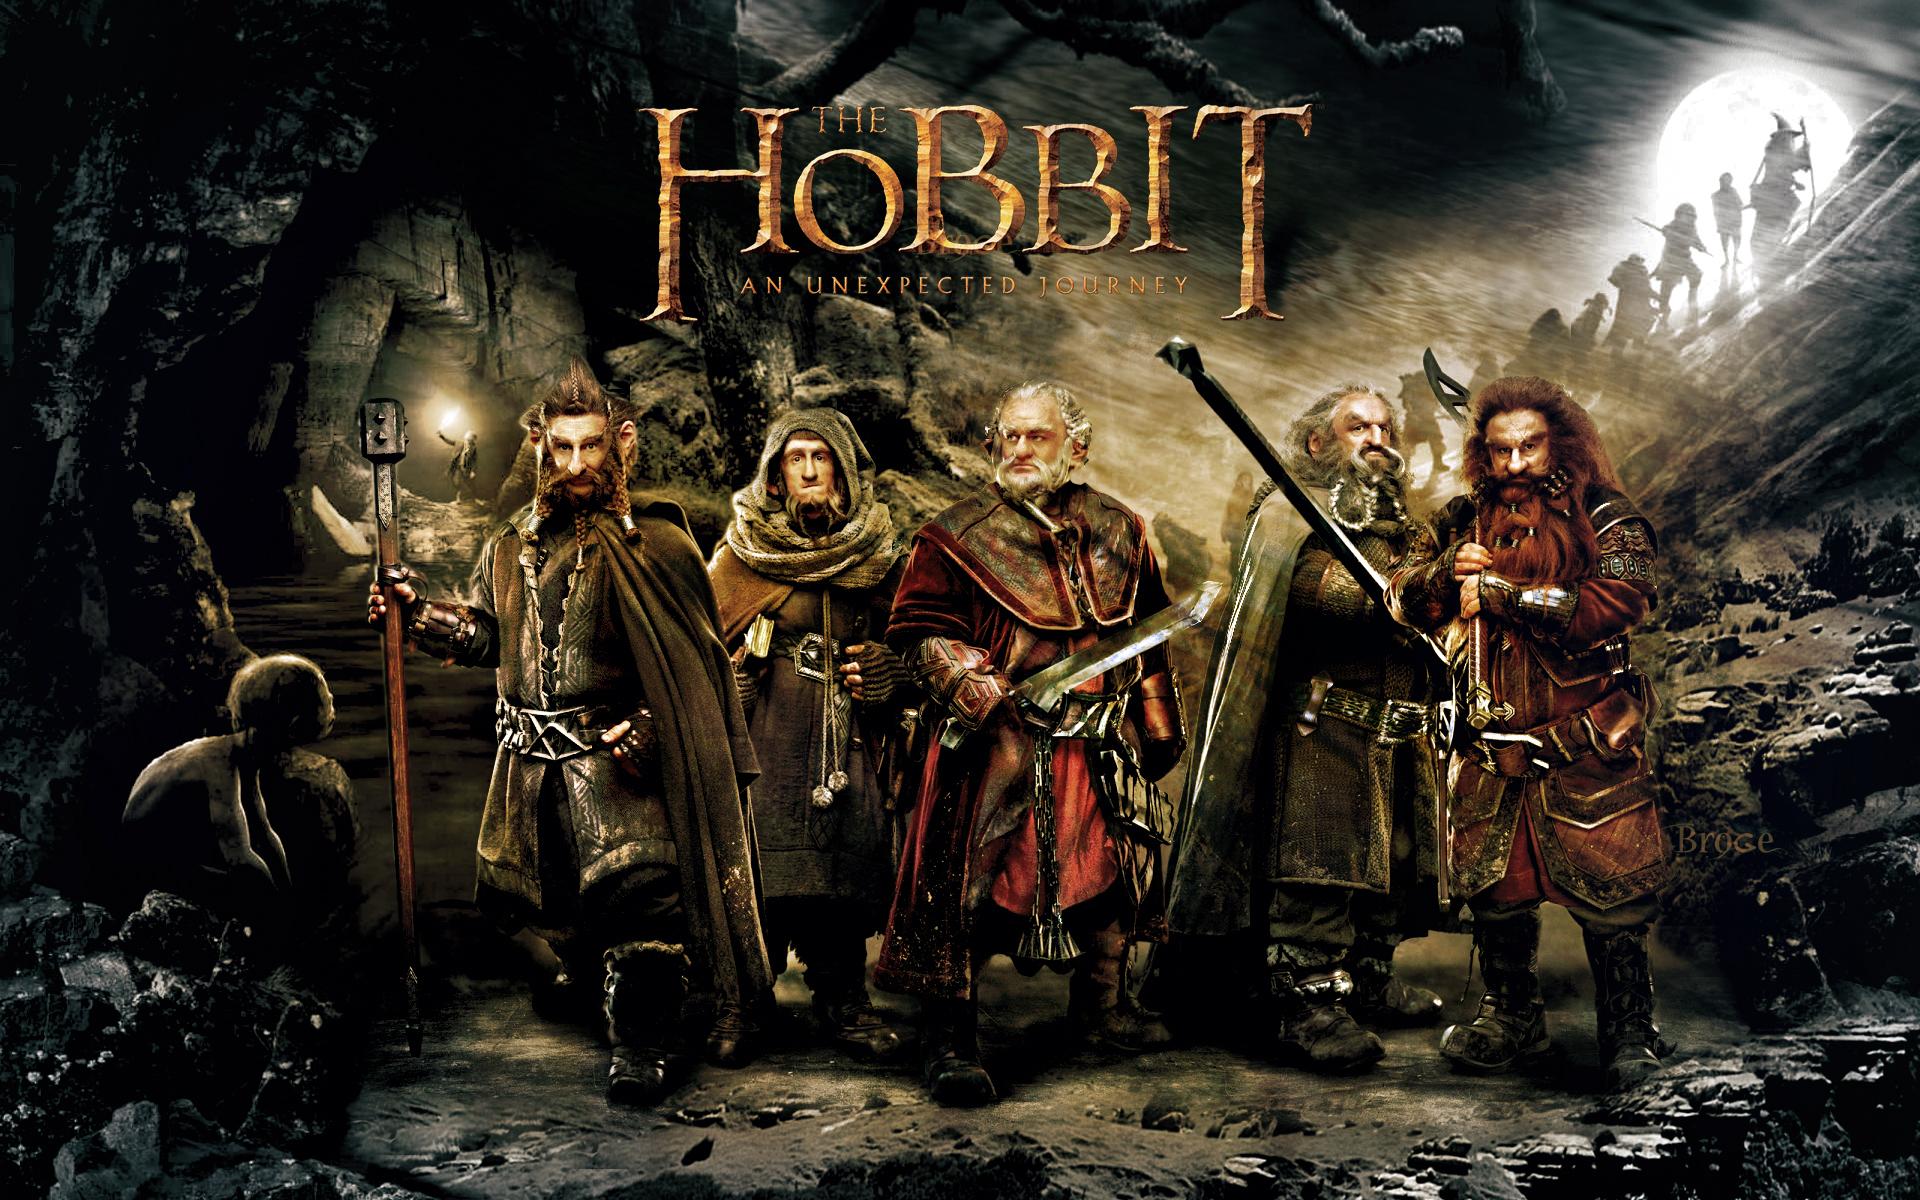 Hobbit Part 1 - An Unexpected Journey 7